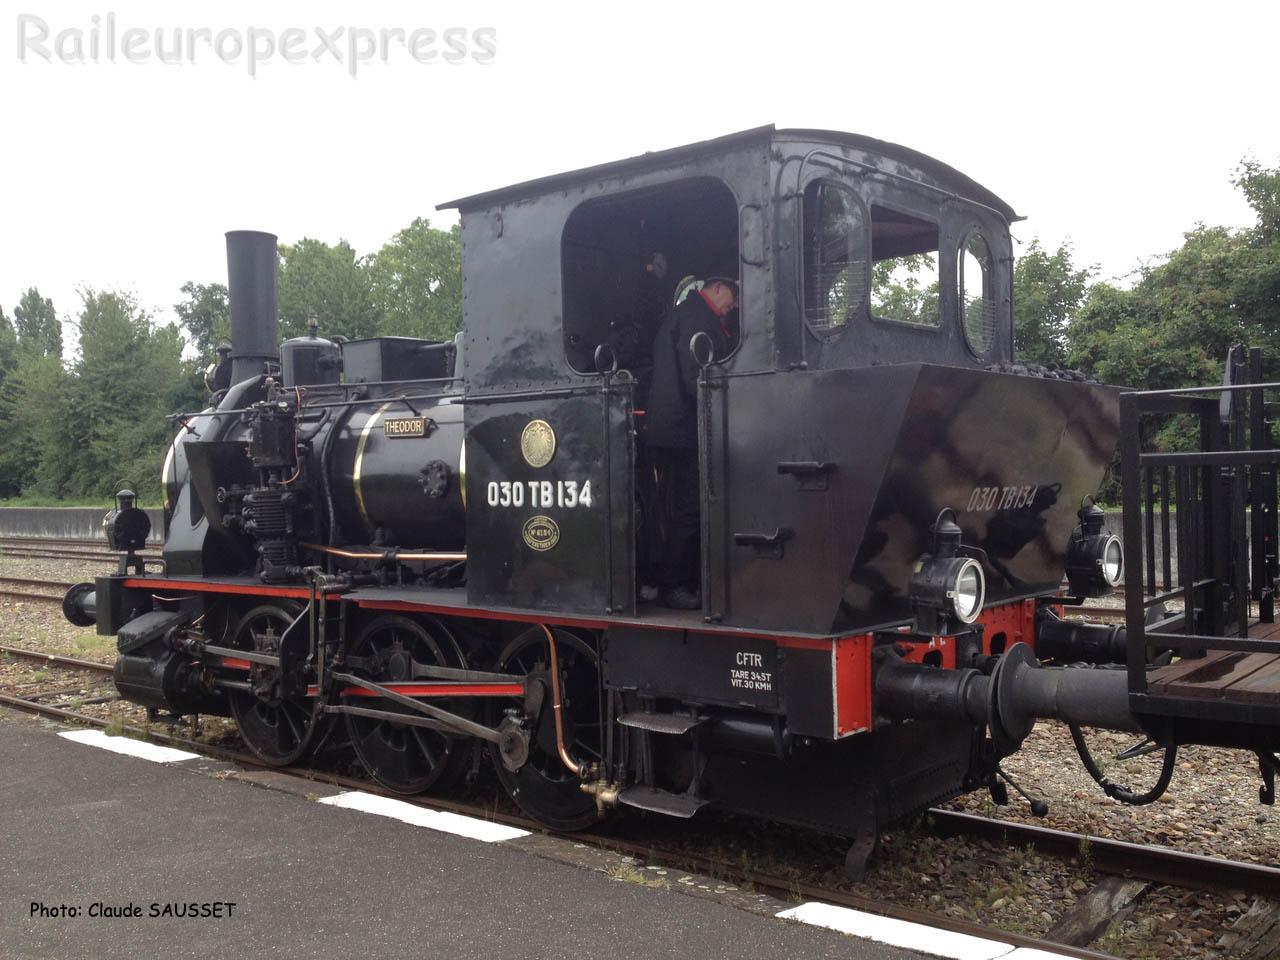 030 TB 134 du CFTR à Volgelsheim (F-68)